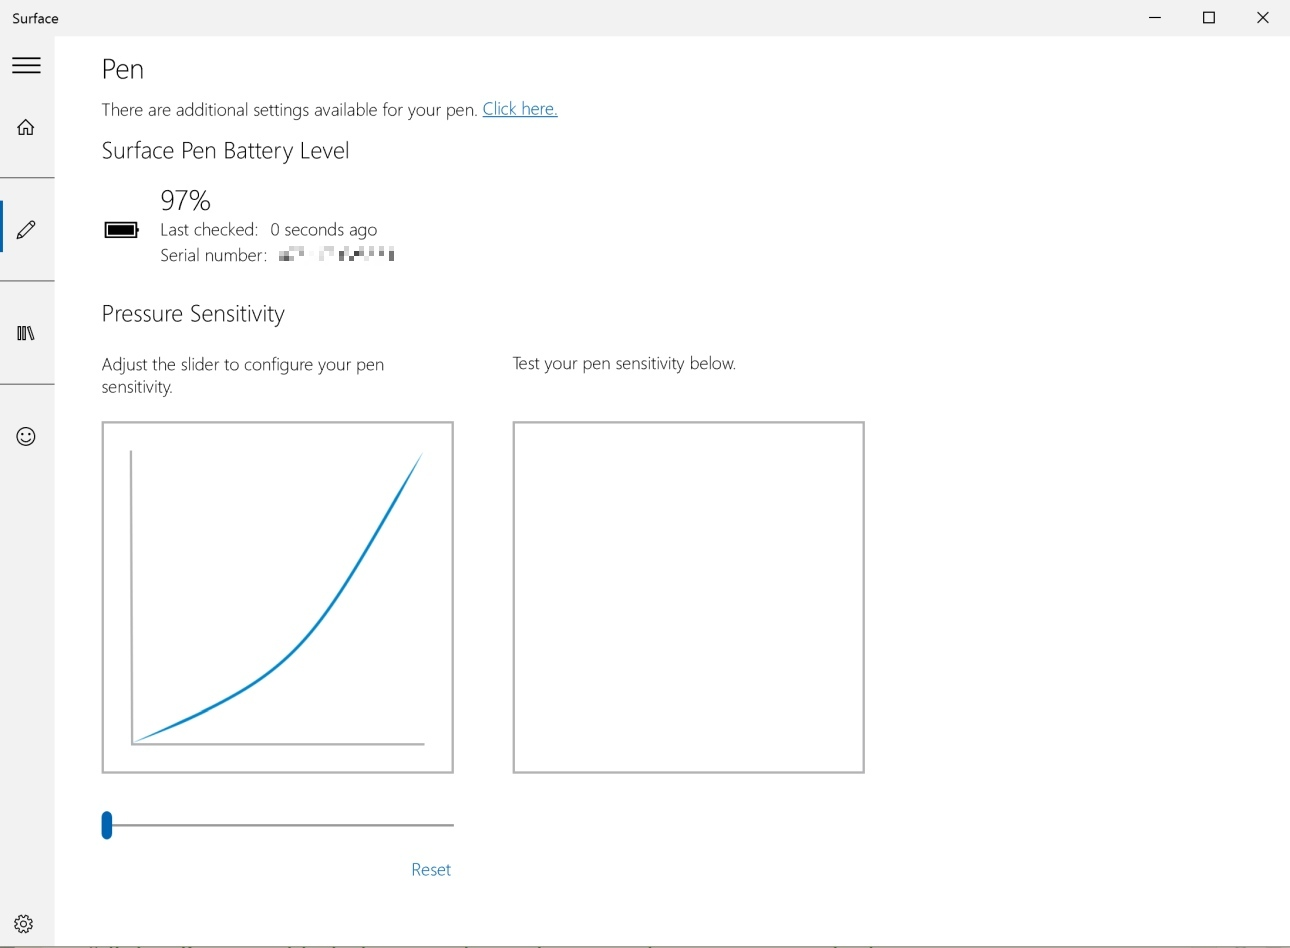 Aplikacja Surface w Surface Booku od Microsoftu - recenzja 90sekund.pl